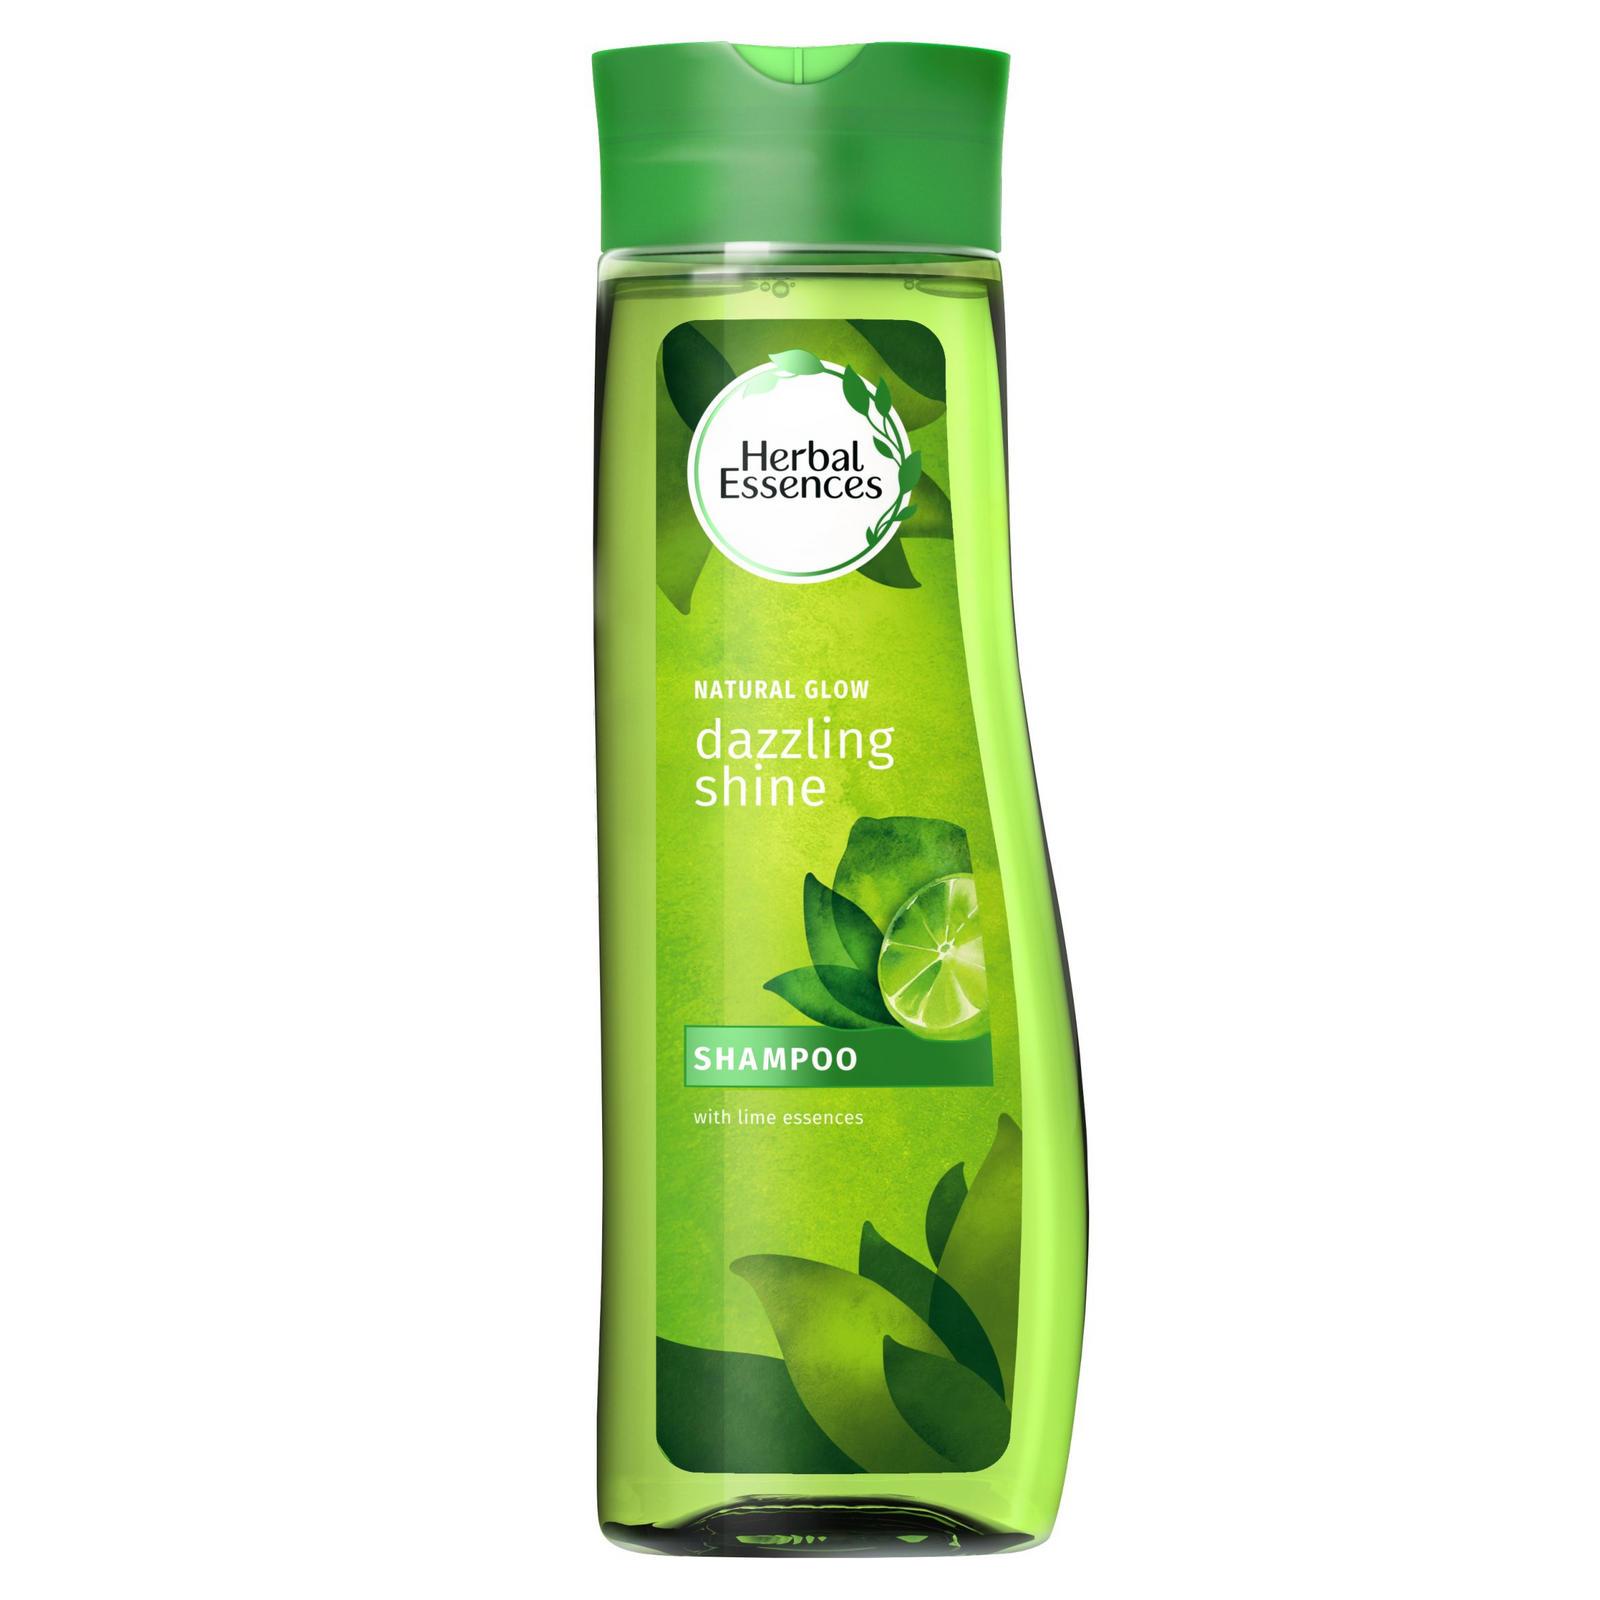 Herbal Essence Shampoo 200ml 50p @ Wilko In Store